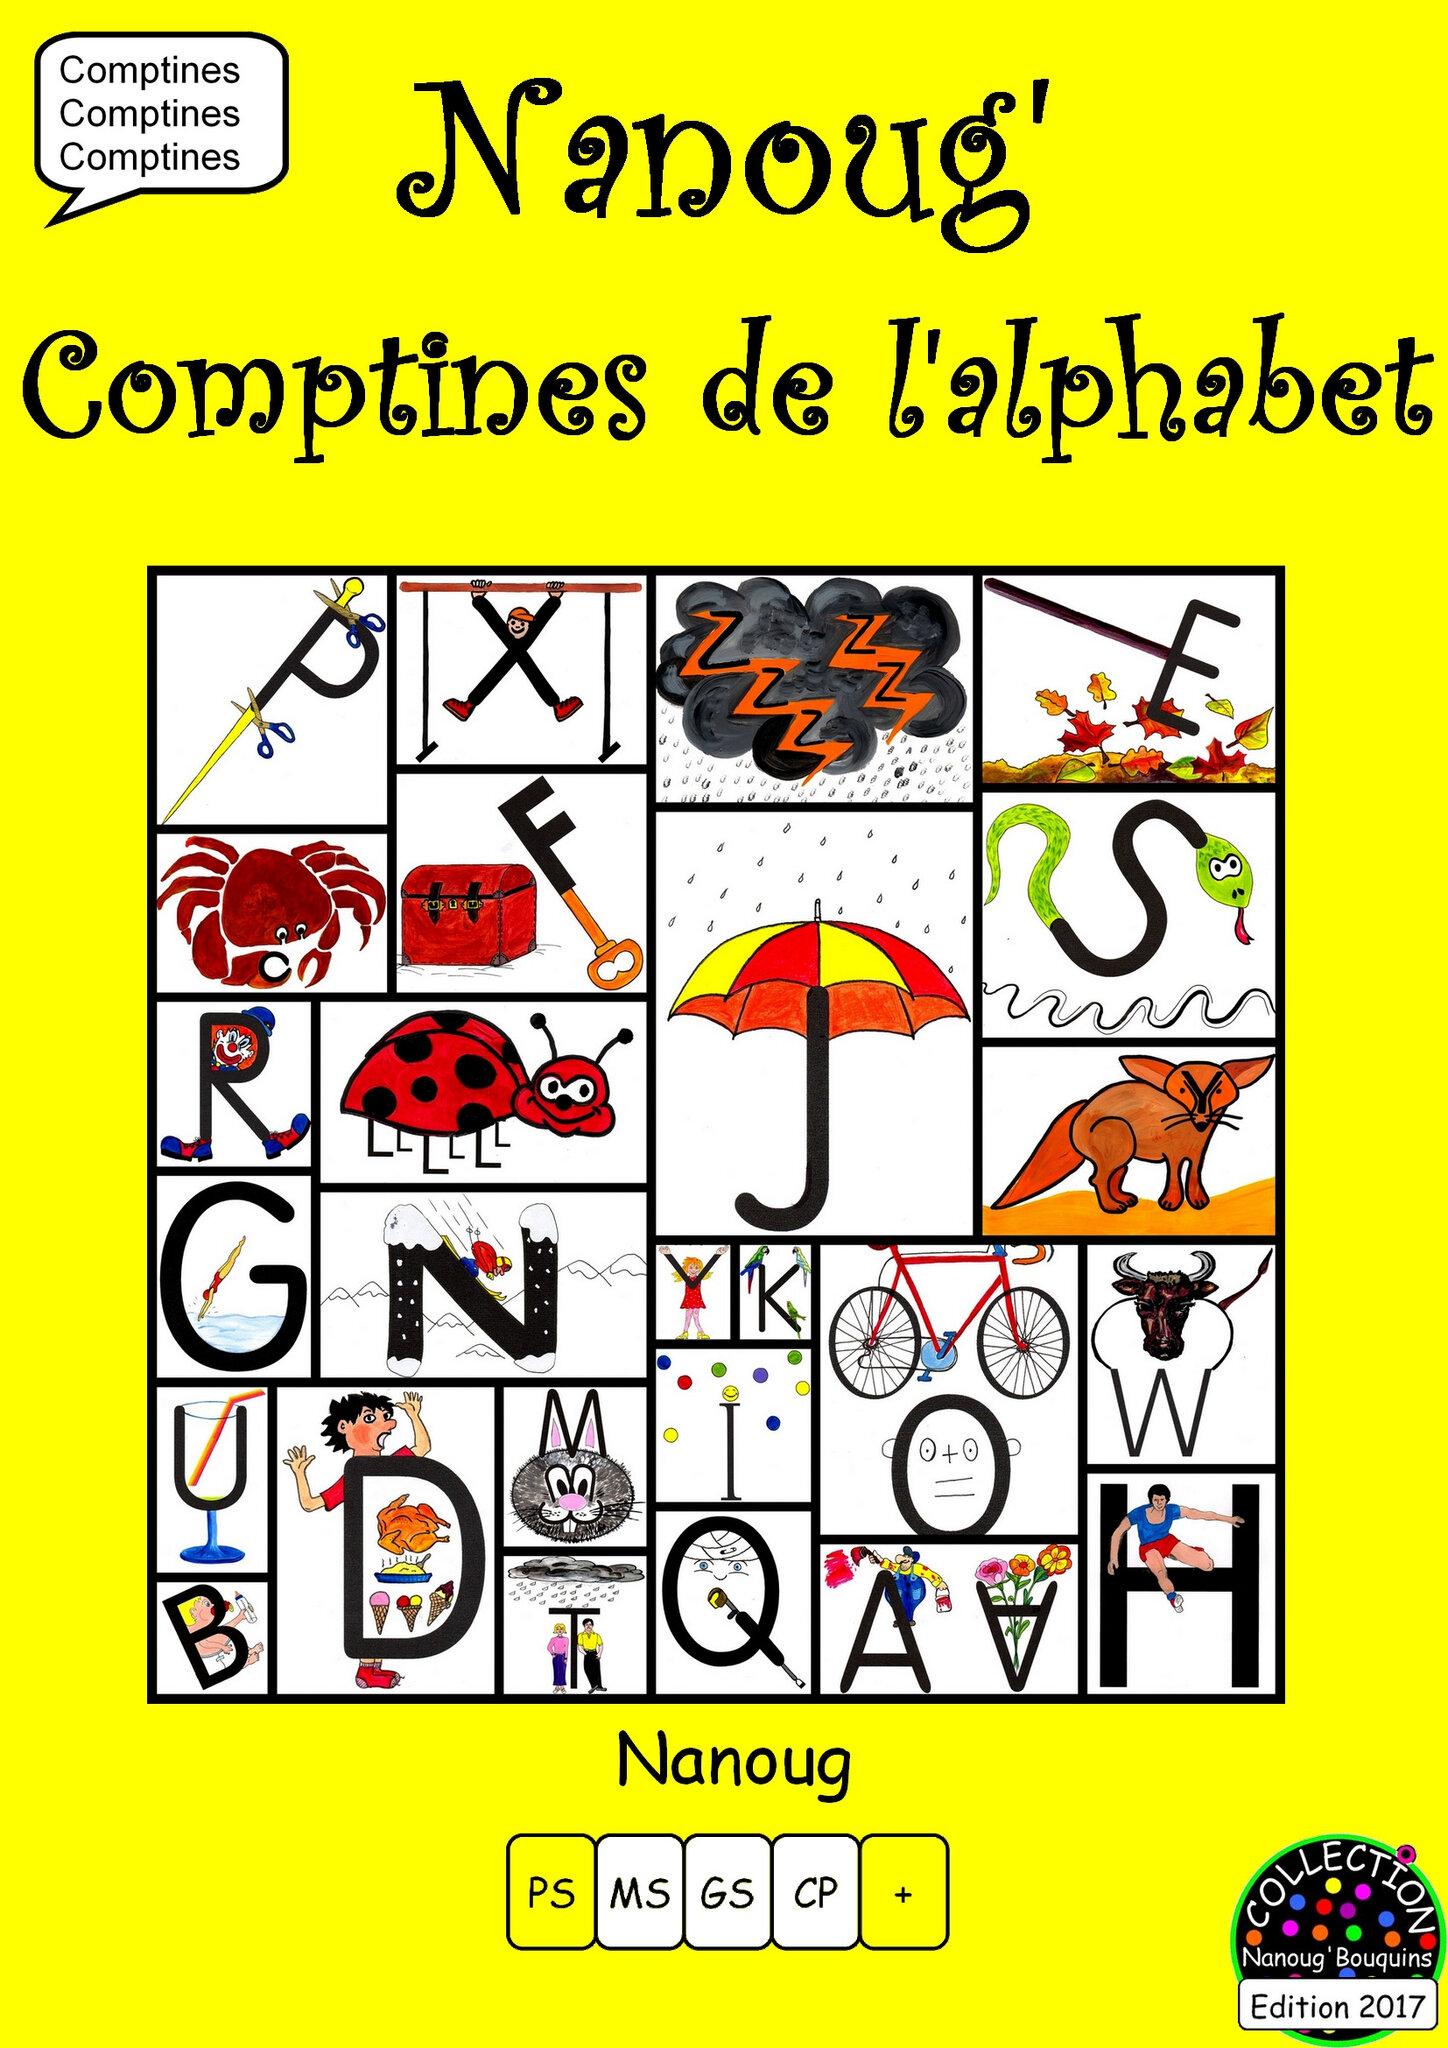 alphabet rencontres idées g Horoscope en hindi match Making